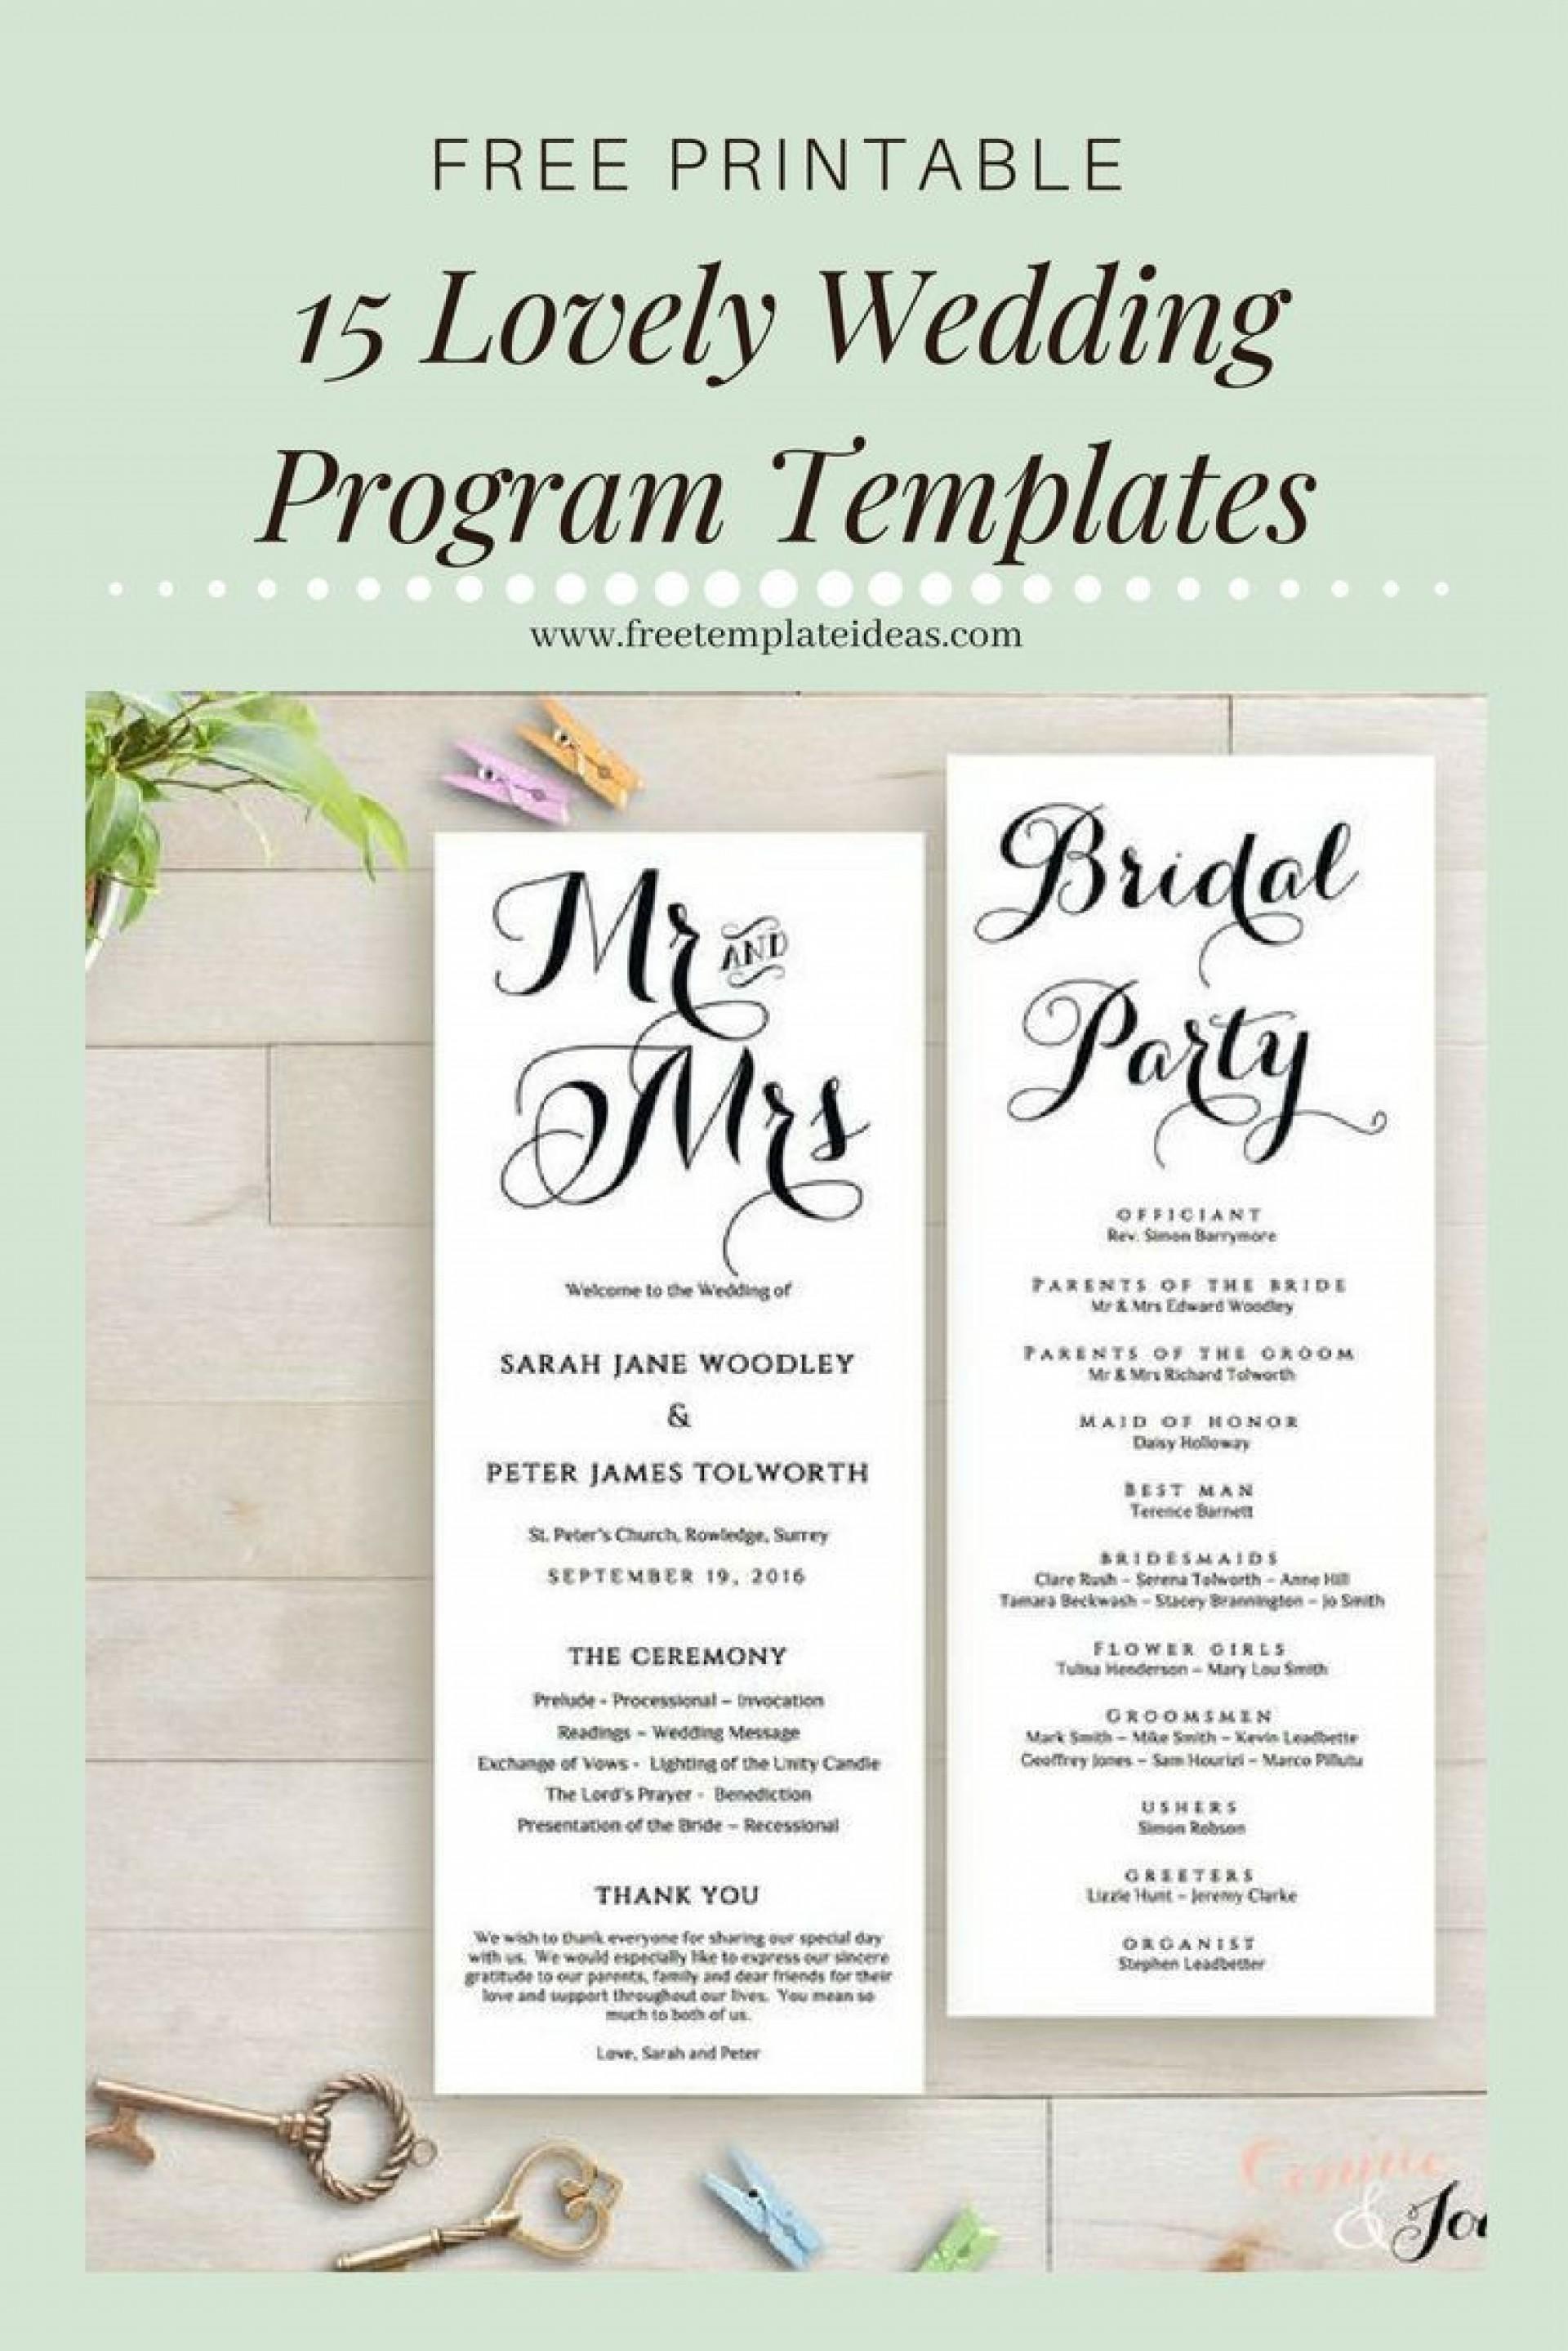 000 Astounding Free Printable Wedding Program Template Inspiration  Templates Microsoft Word Indian1920